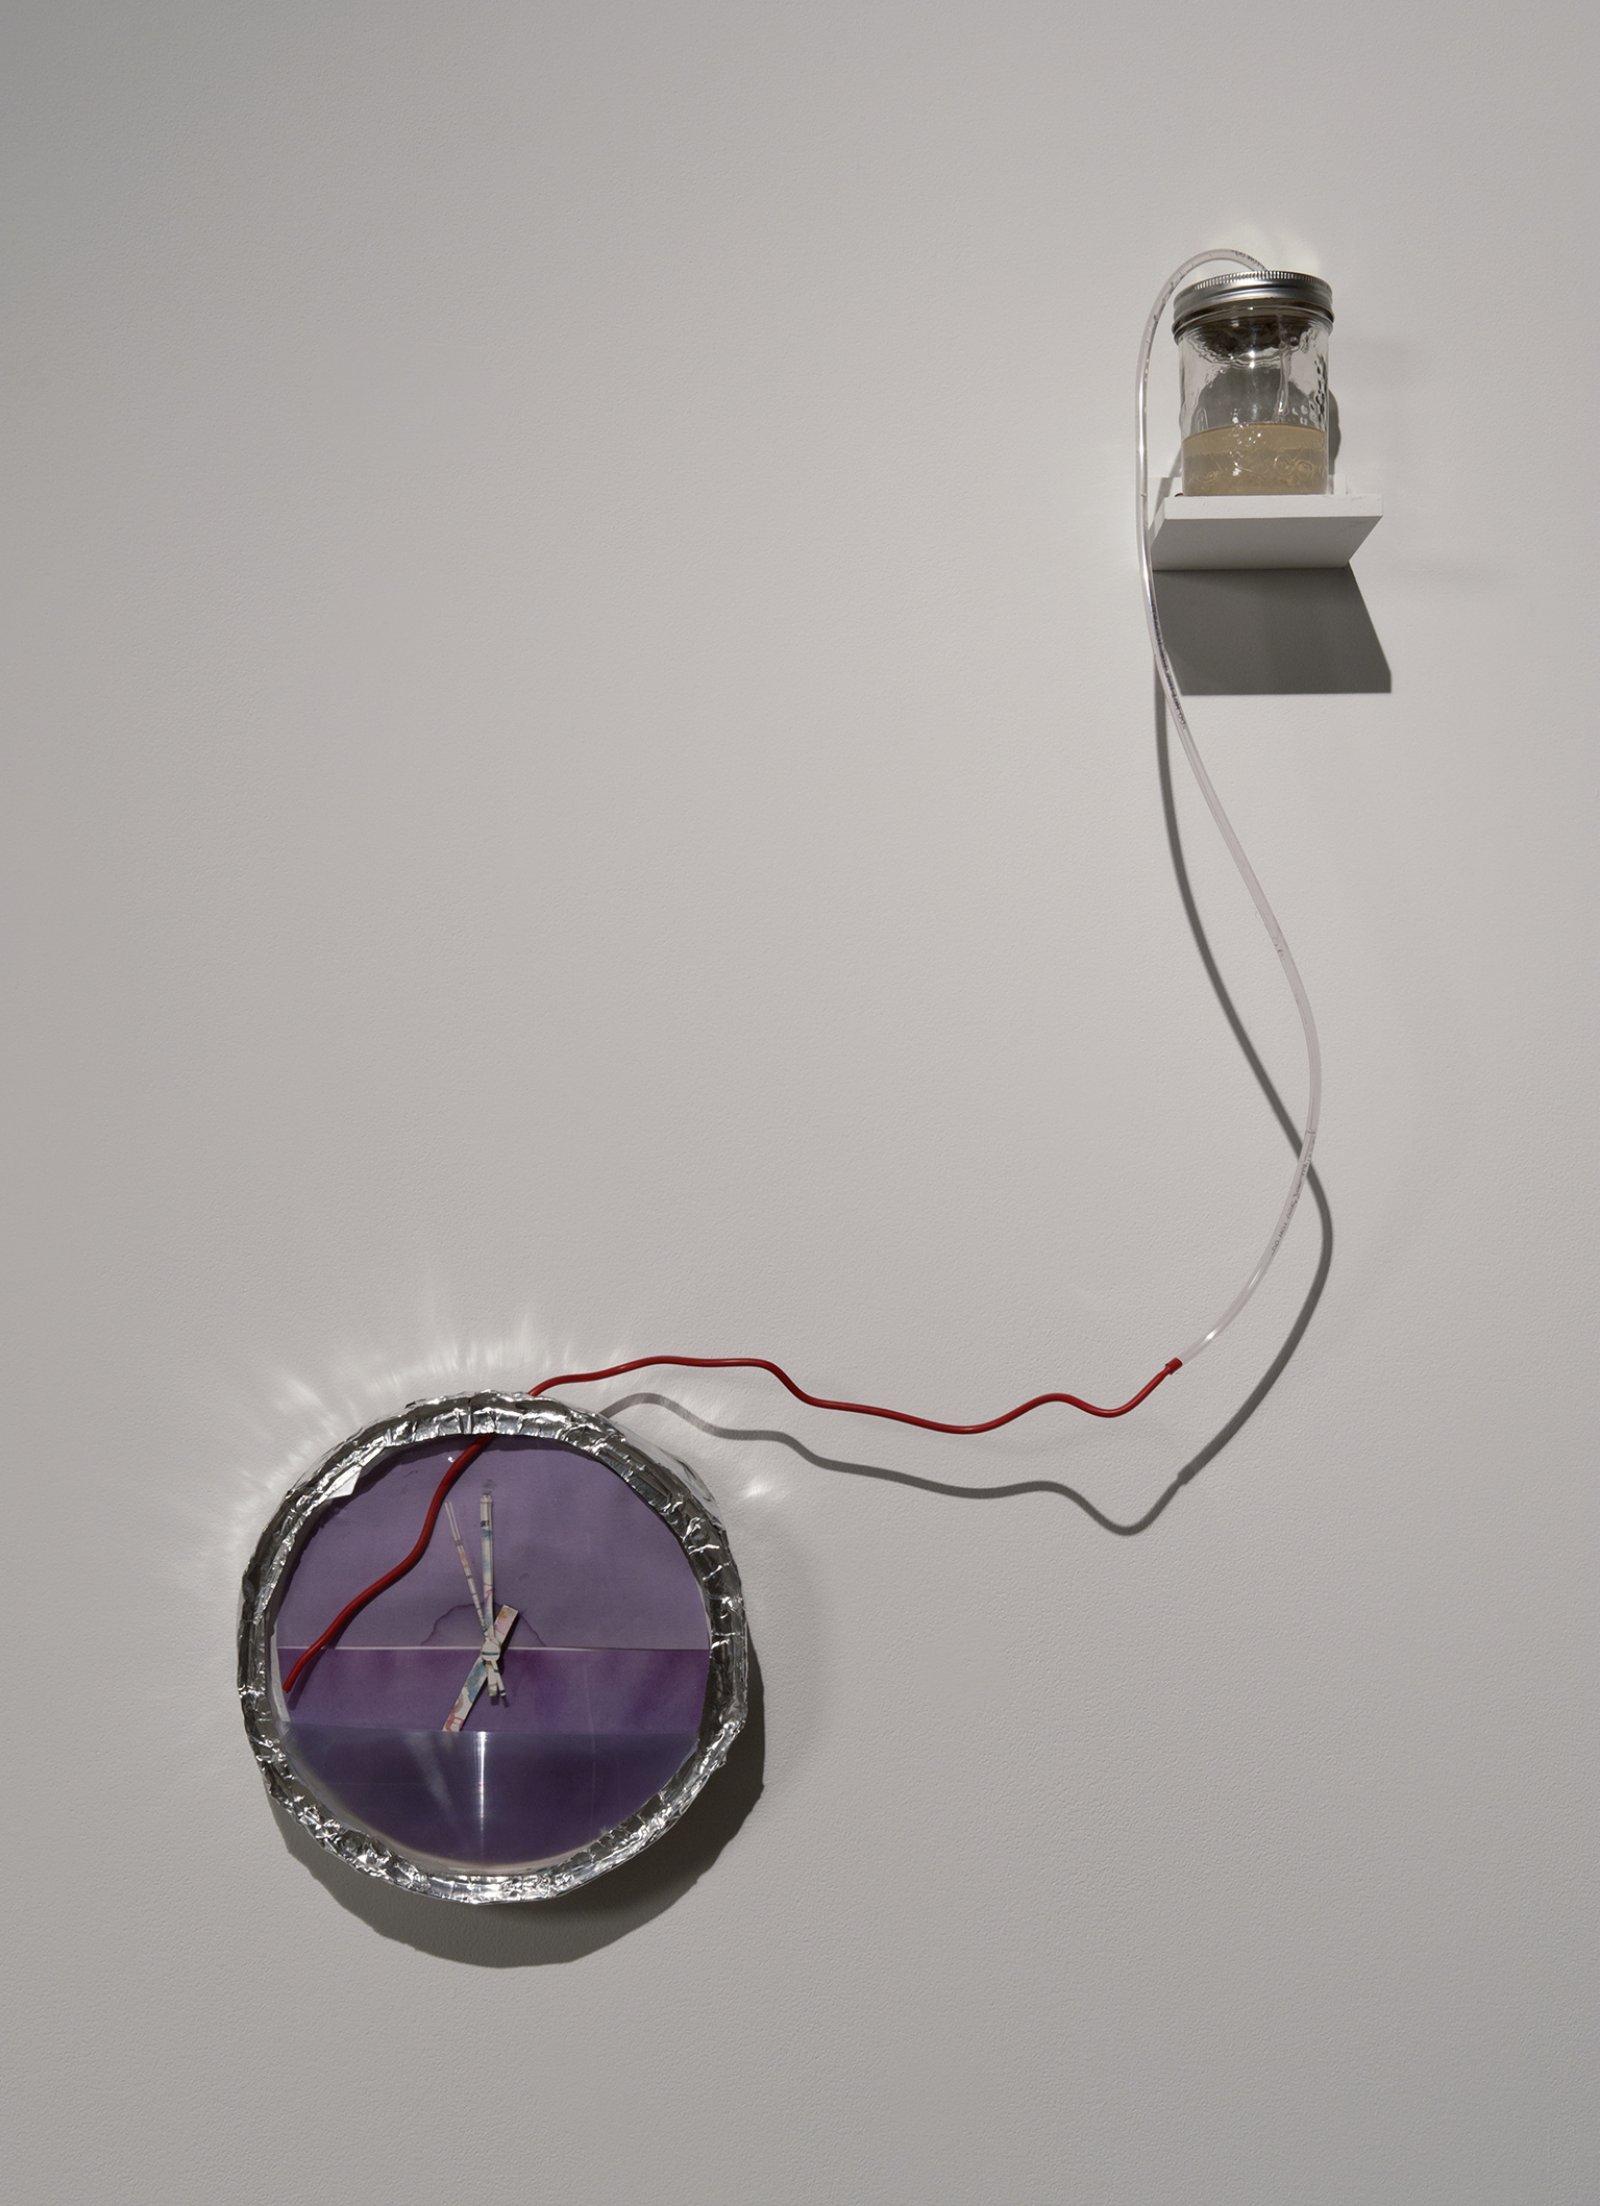 Julia Feyrer, Litmus Clock (Bifocal), 2012, fresnel lens, neutral litmus paper, convex glass, watercolour clock hands, home-brewed mead in jar, plastic clock body, metal flashing, vinyl tubing, quartz clock movement by Julia Feyrer